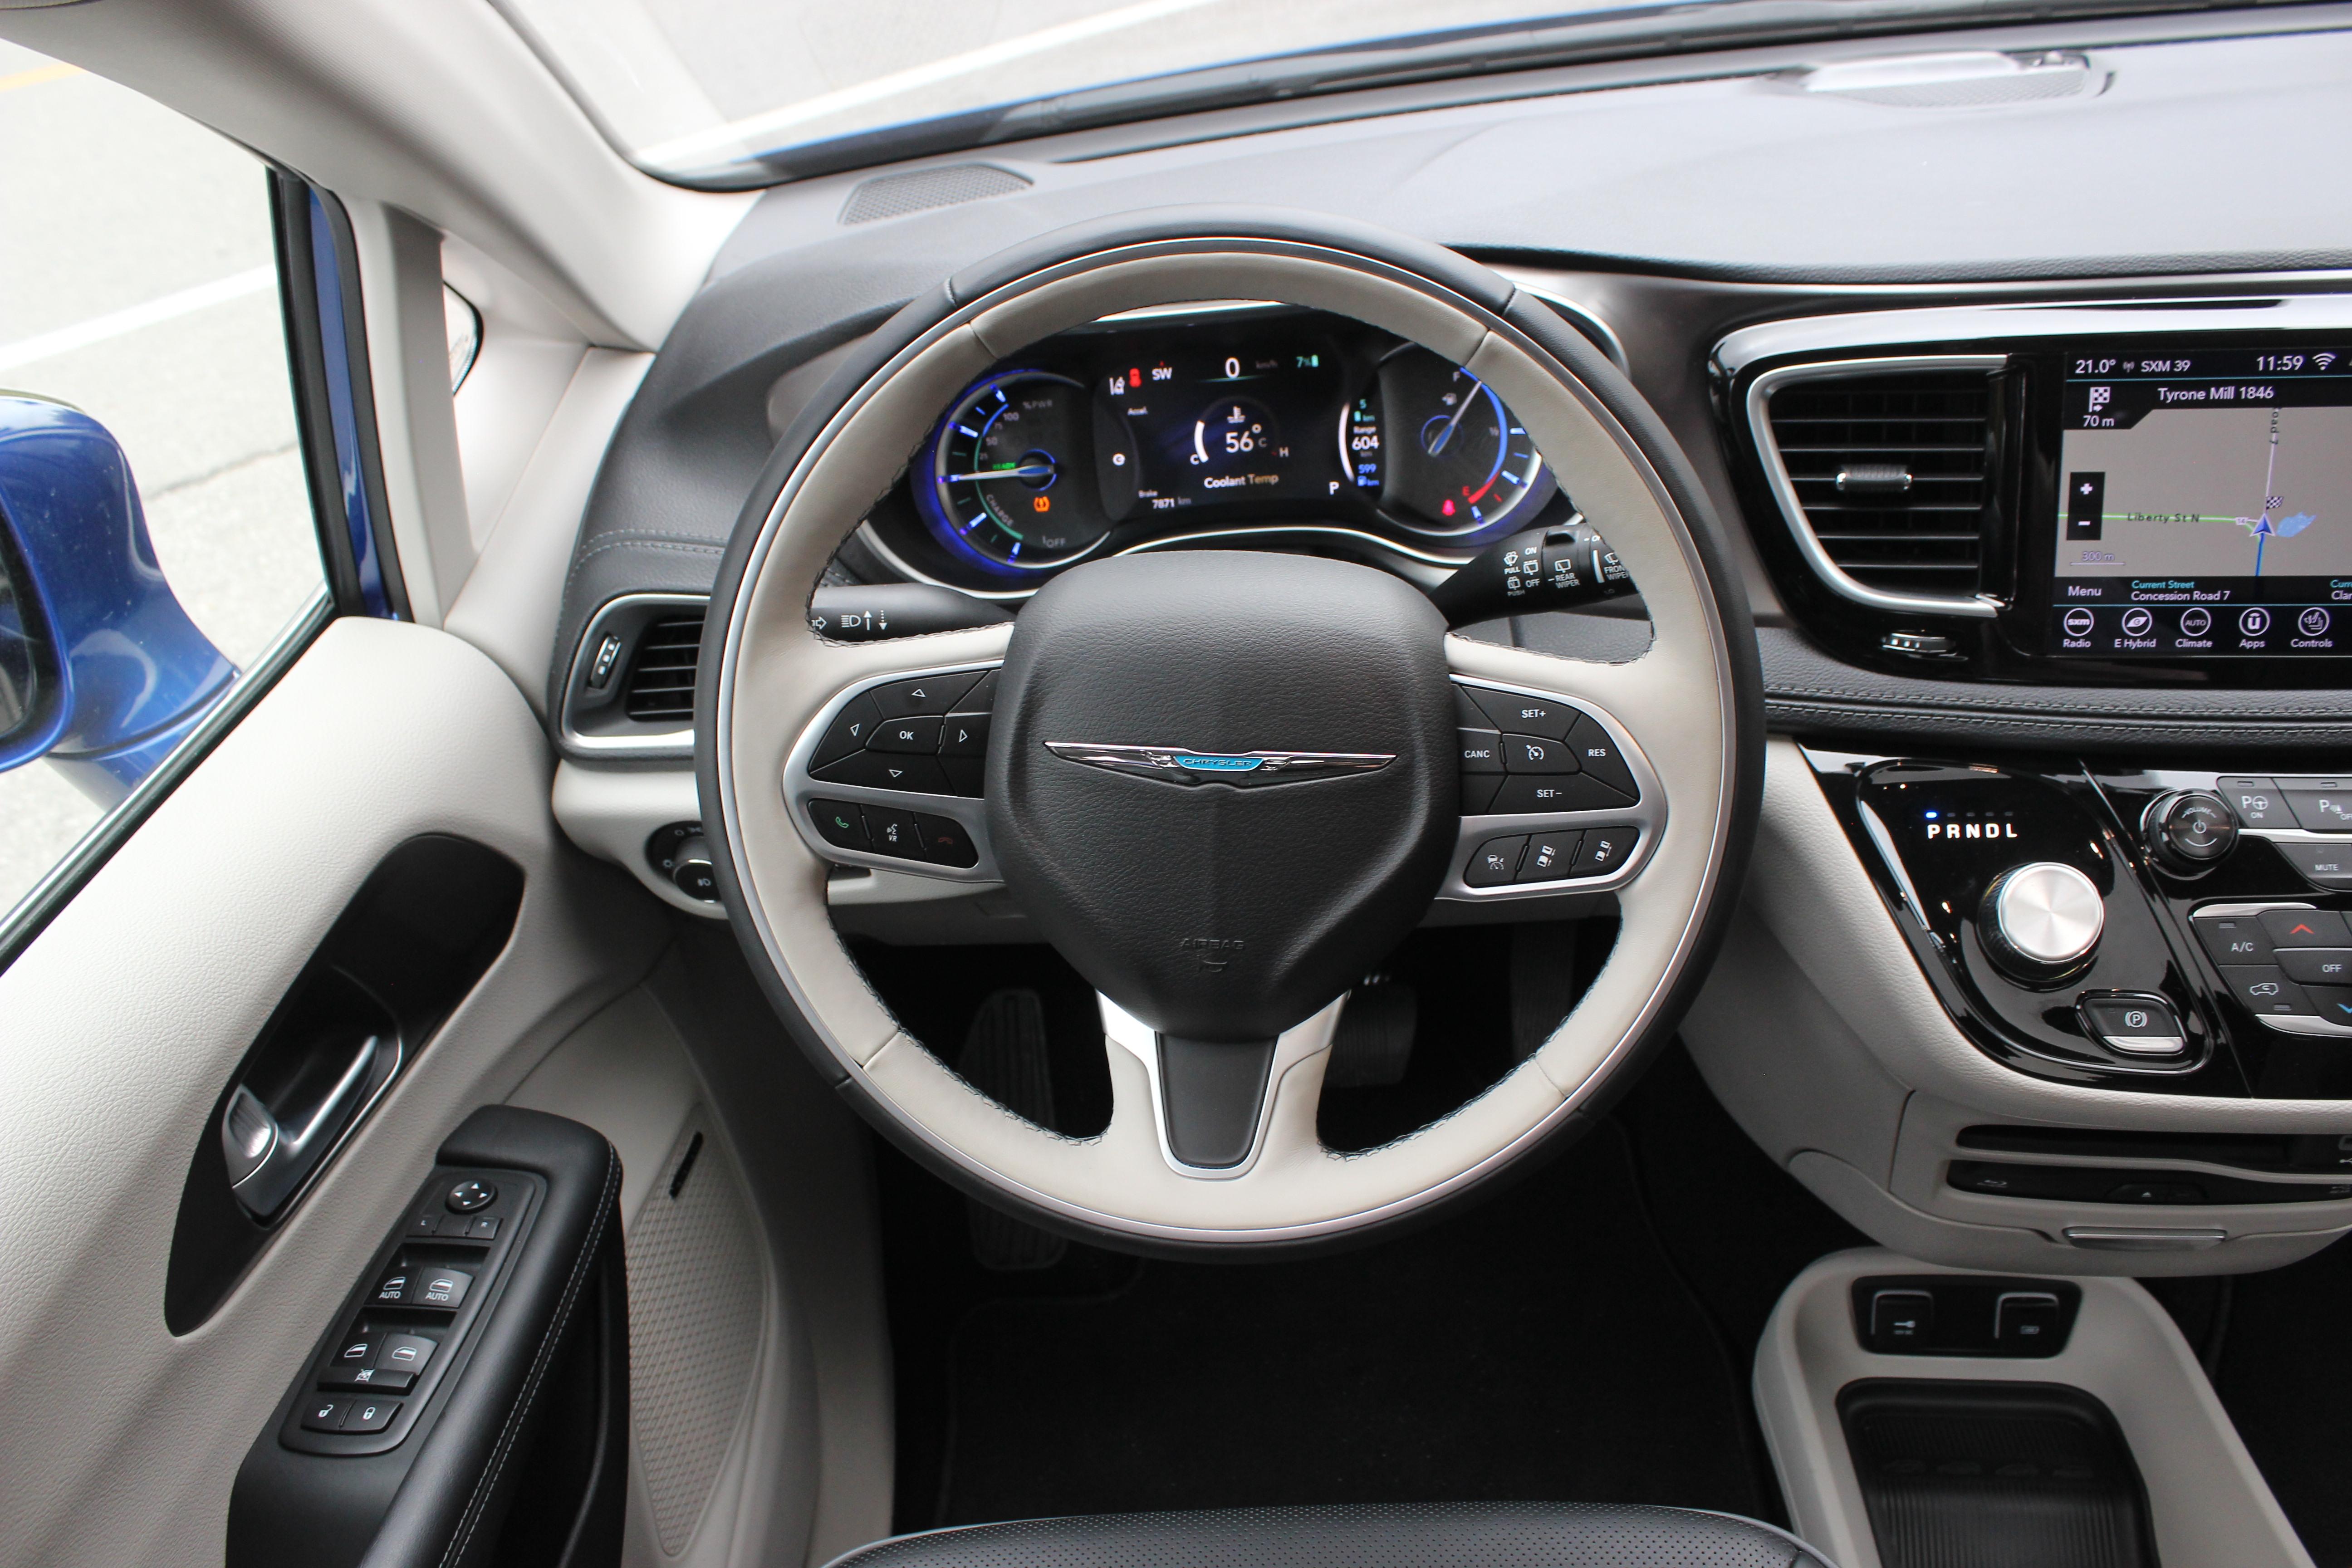 Best EV/PHEV Car 2019 Canadian Car of the Year